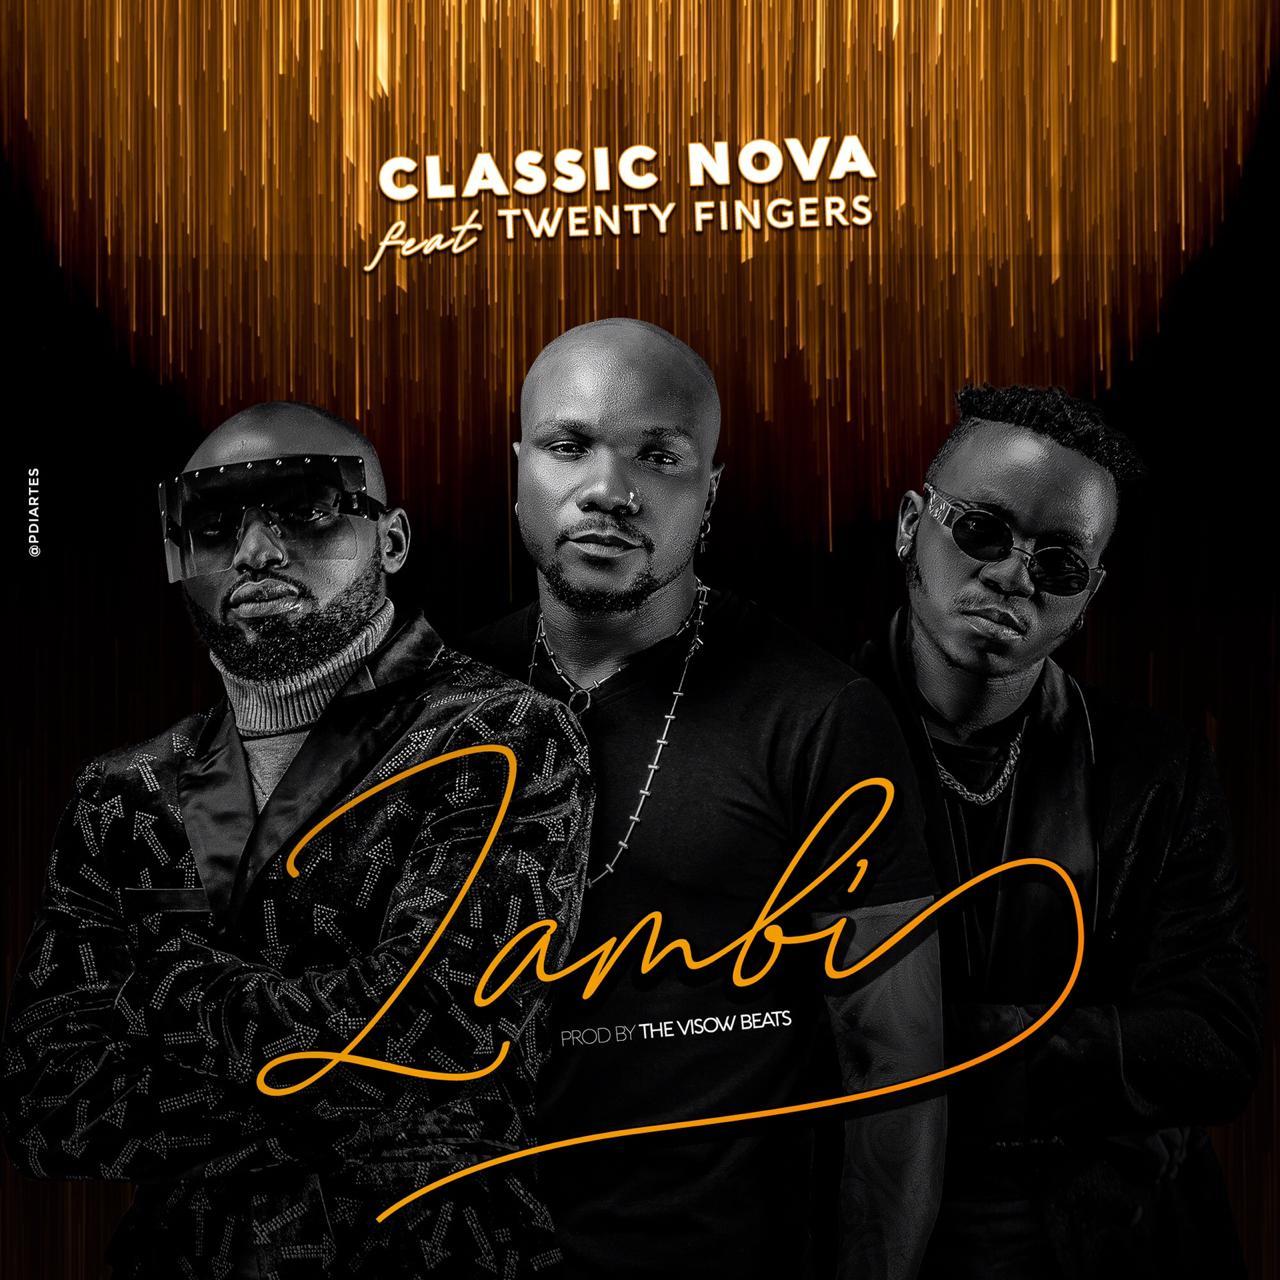 Classic Nova - Zambi ft Twewnty Fingers